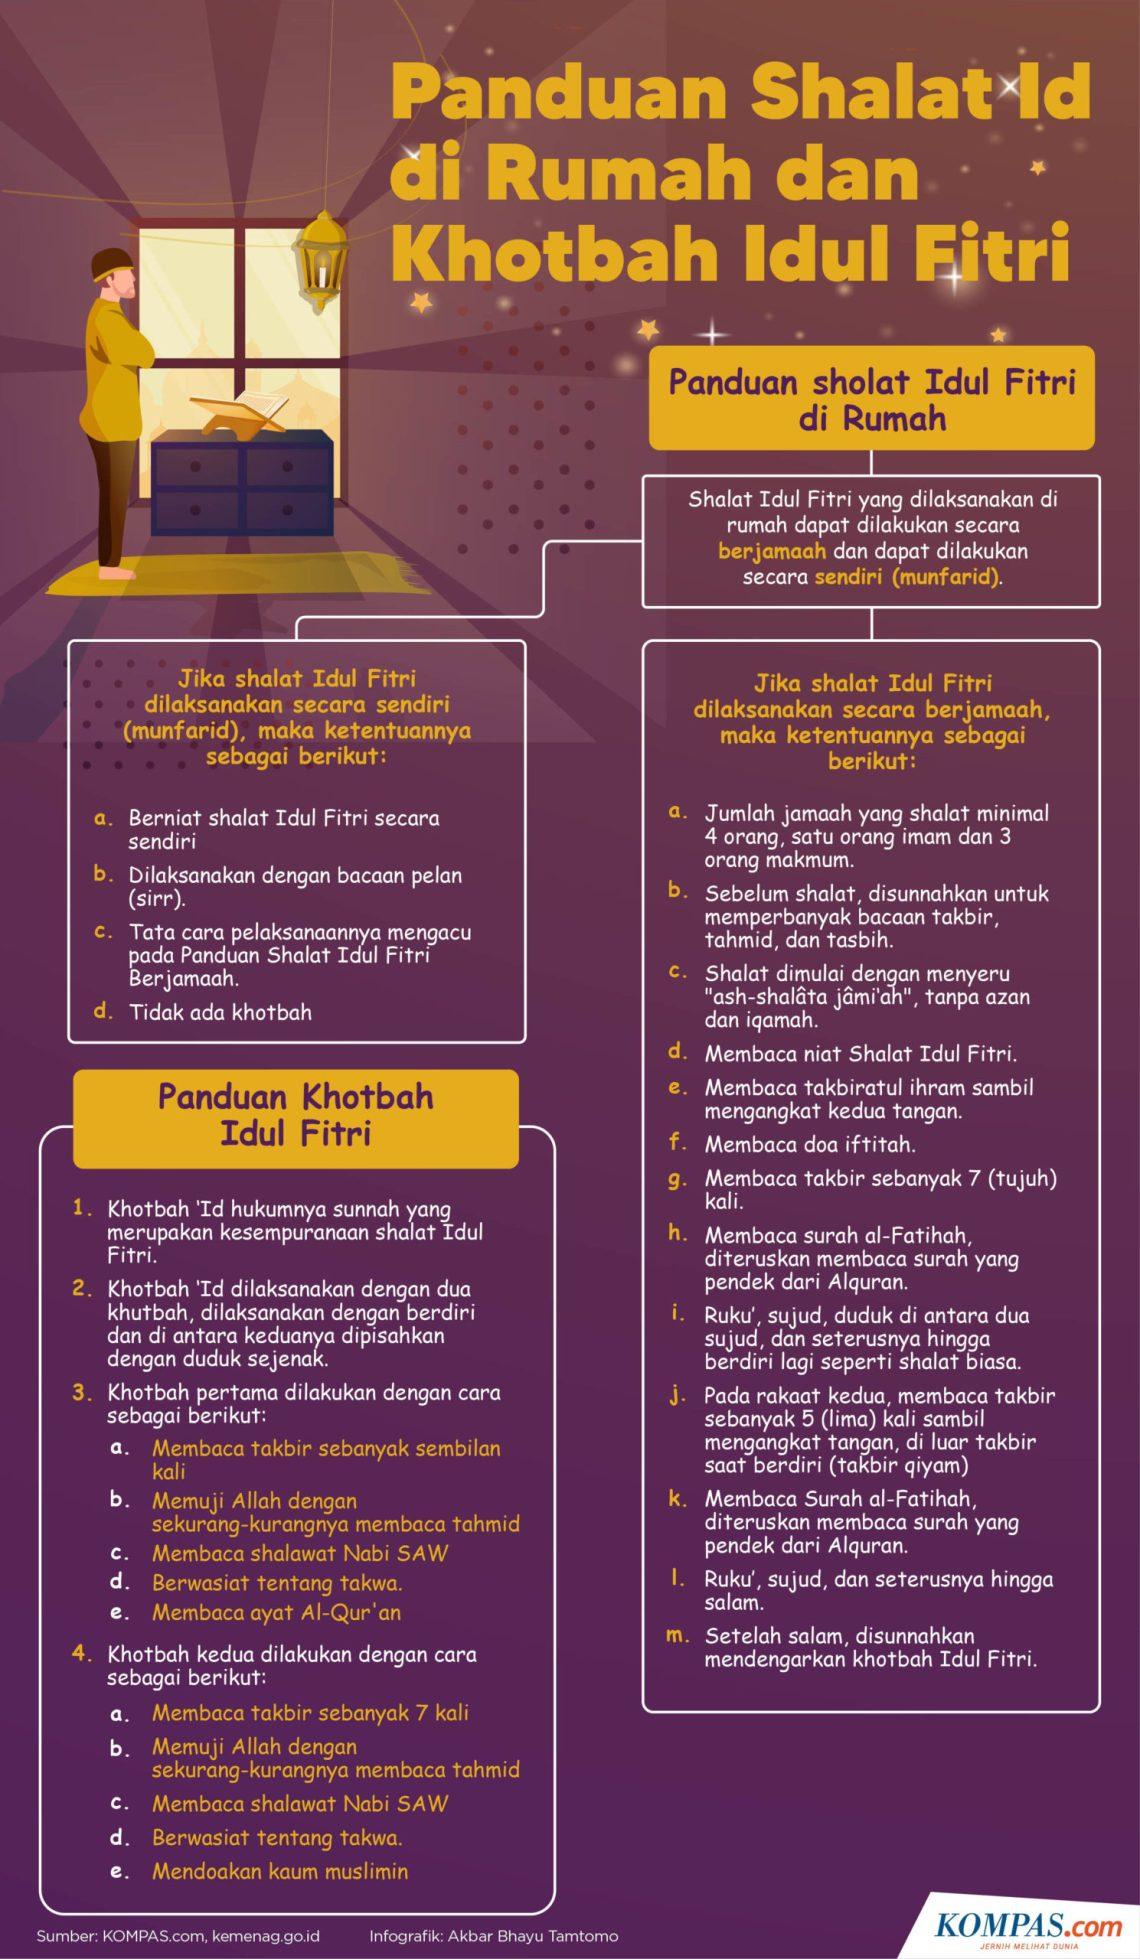 Infografis Panduan shalat Id di rumah